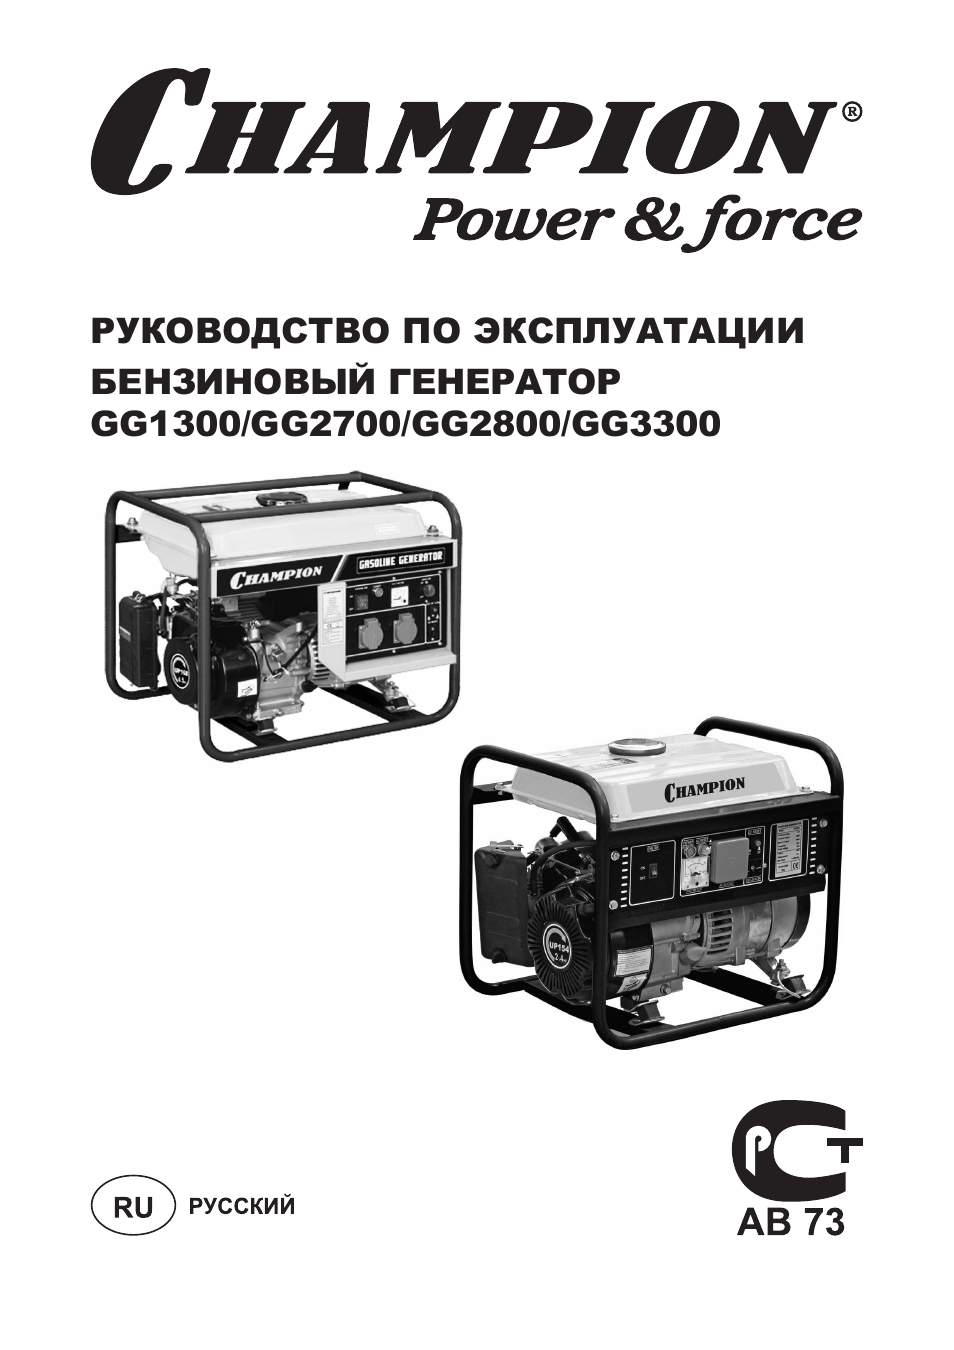 Инструкция По Эксплуатации Champion Gg7501-3e